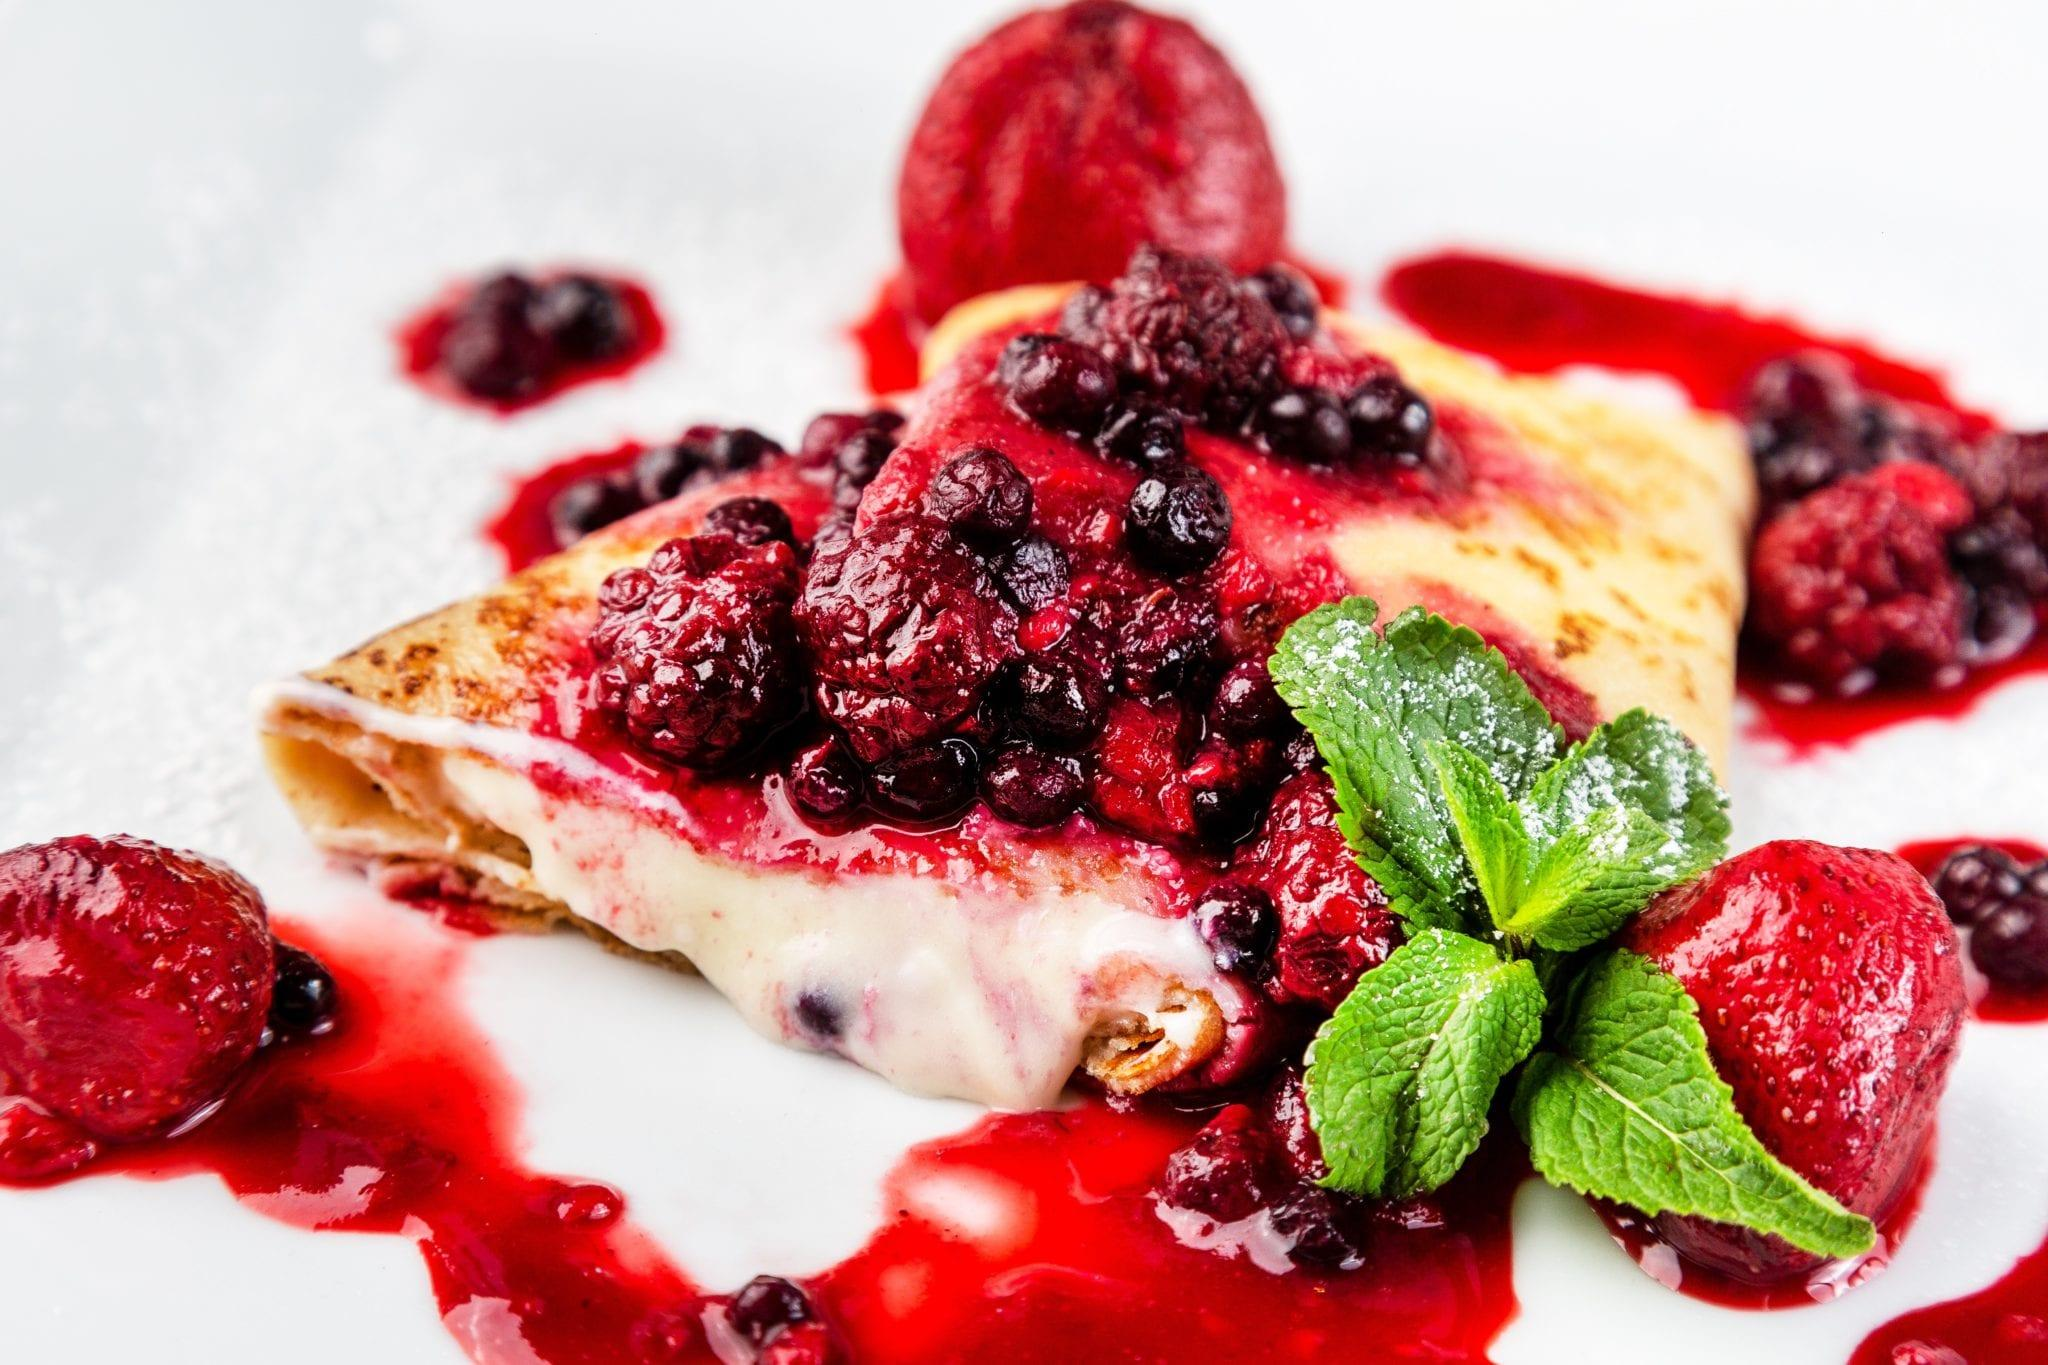 Горячие блинчики с сыром Маскарпоне и клубникой | Hot pancakes with mascarpone cheese and strawberries